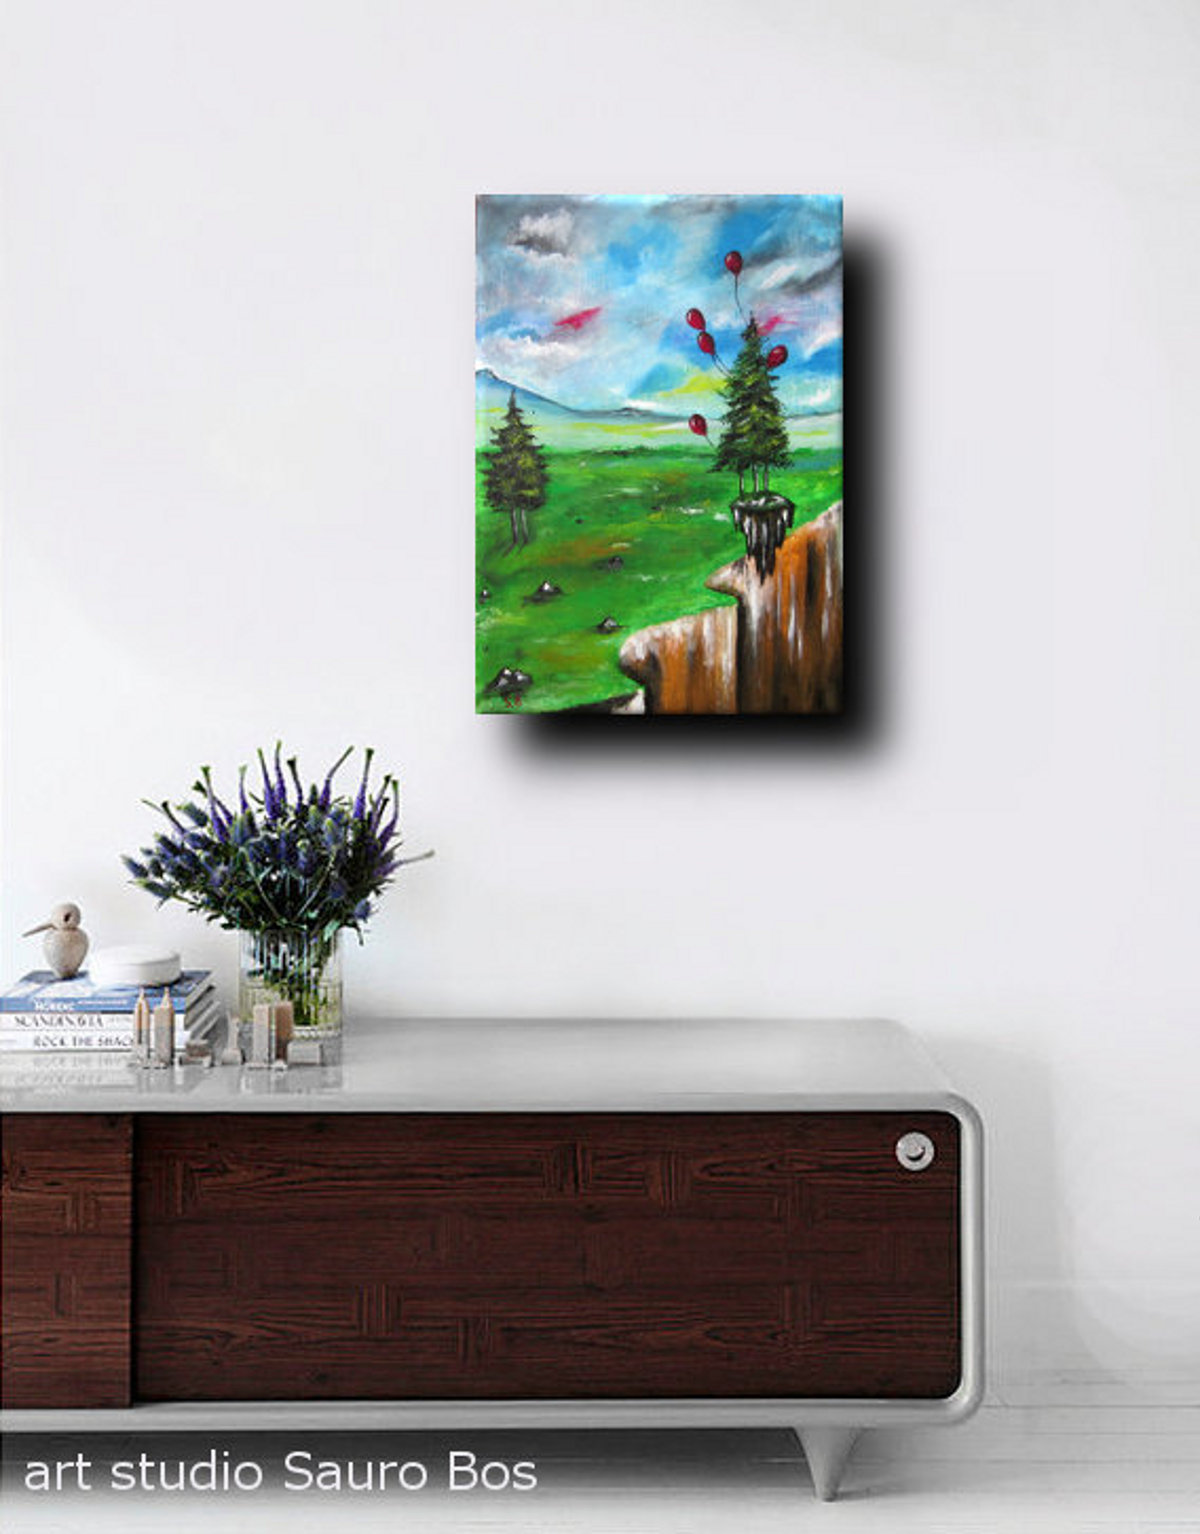 palloncini salva alberodx - dipinto surreale titolo palloncini salva albero-70x50